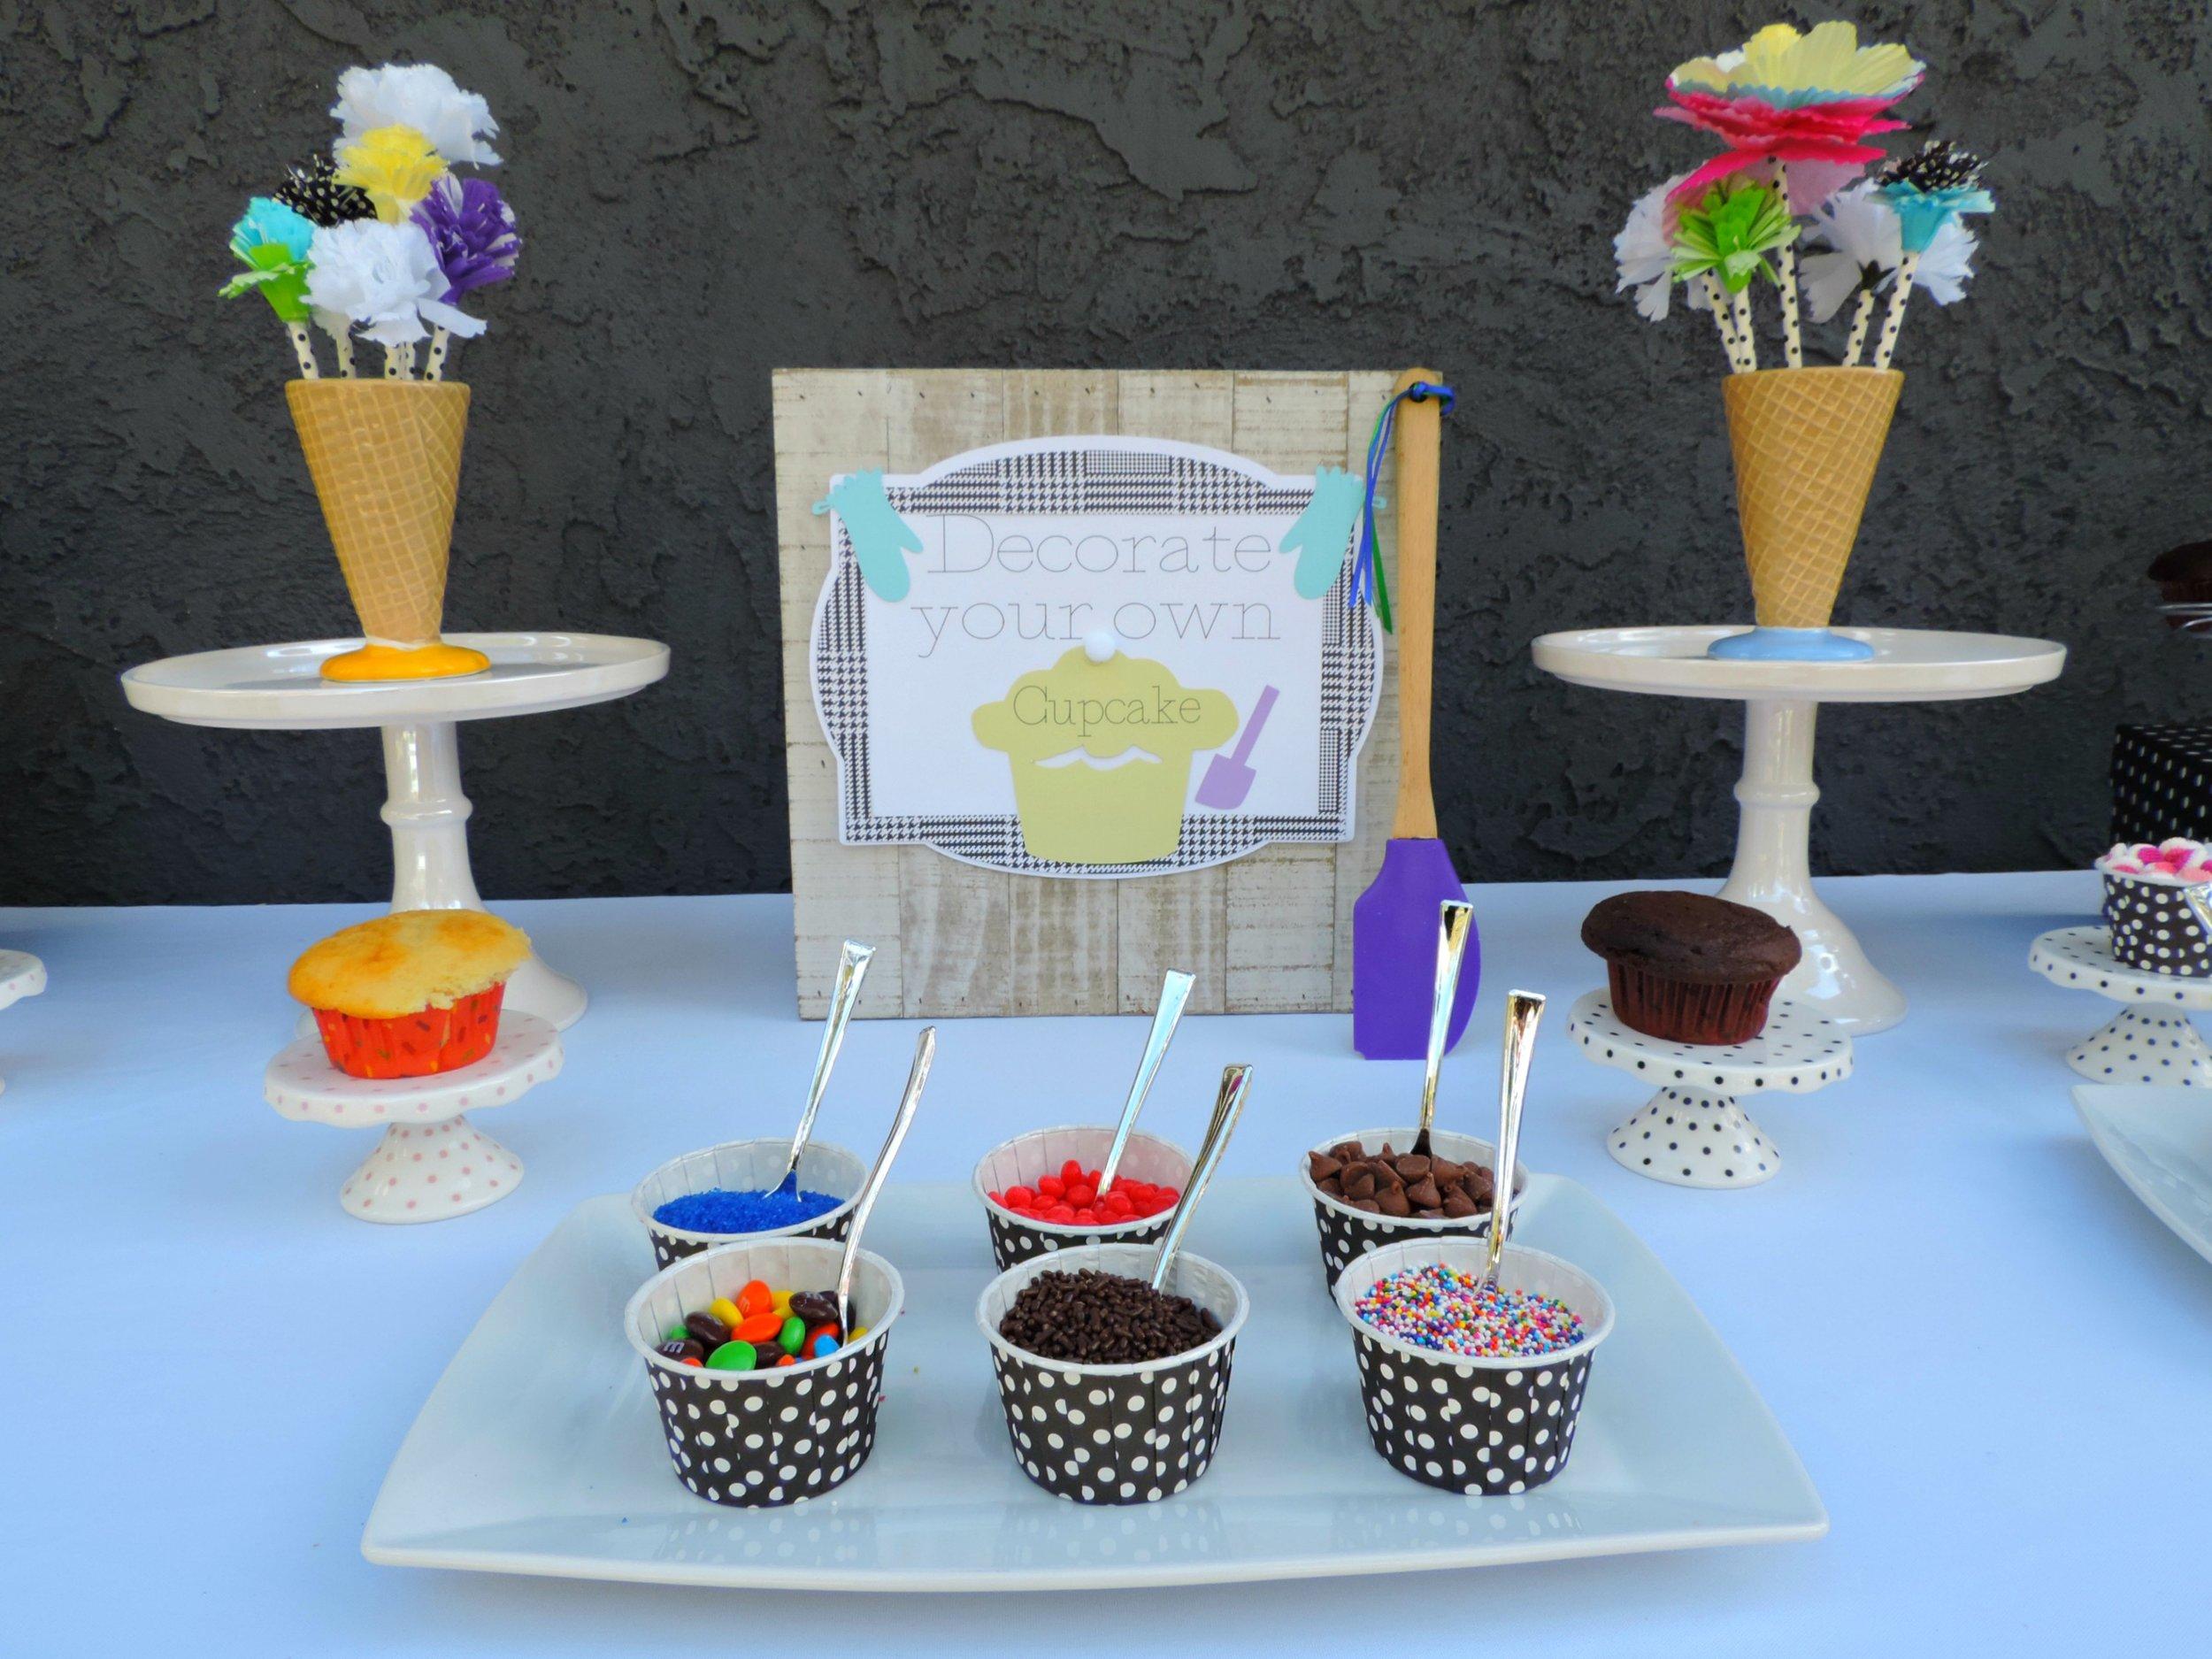 Cupcake wars-cupcake party ideas- cupcake party ideas-cupcake sprinkles -diy cupcakes-cupcakes birthday party-www.SugarPartiesLA.com.jpg